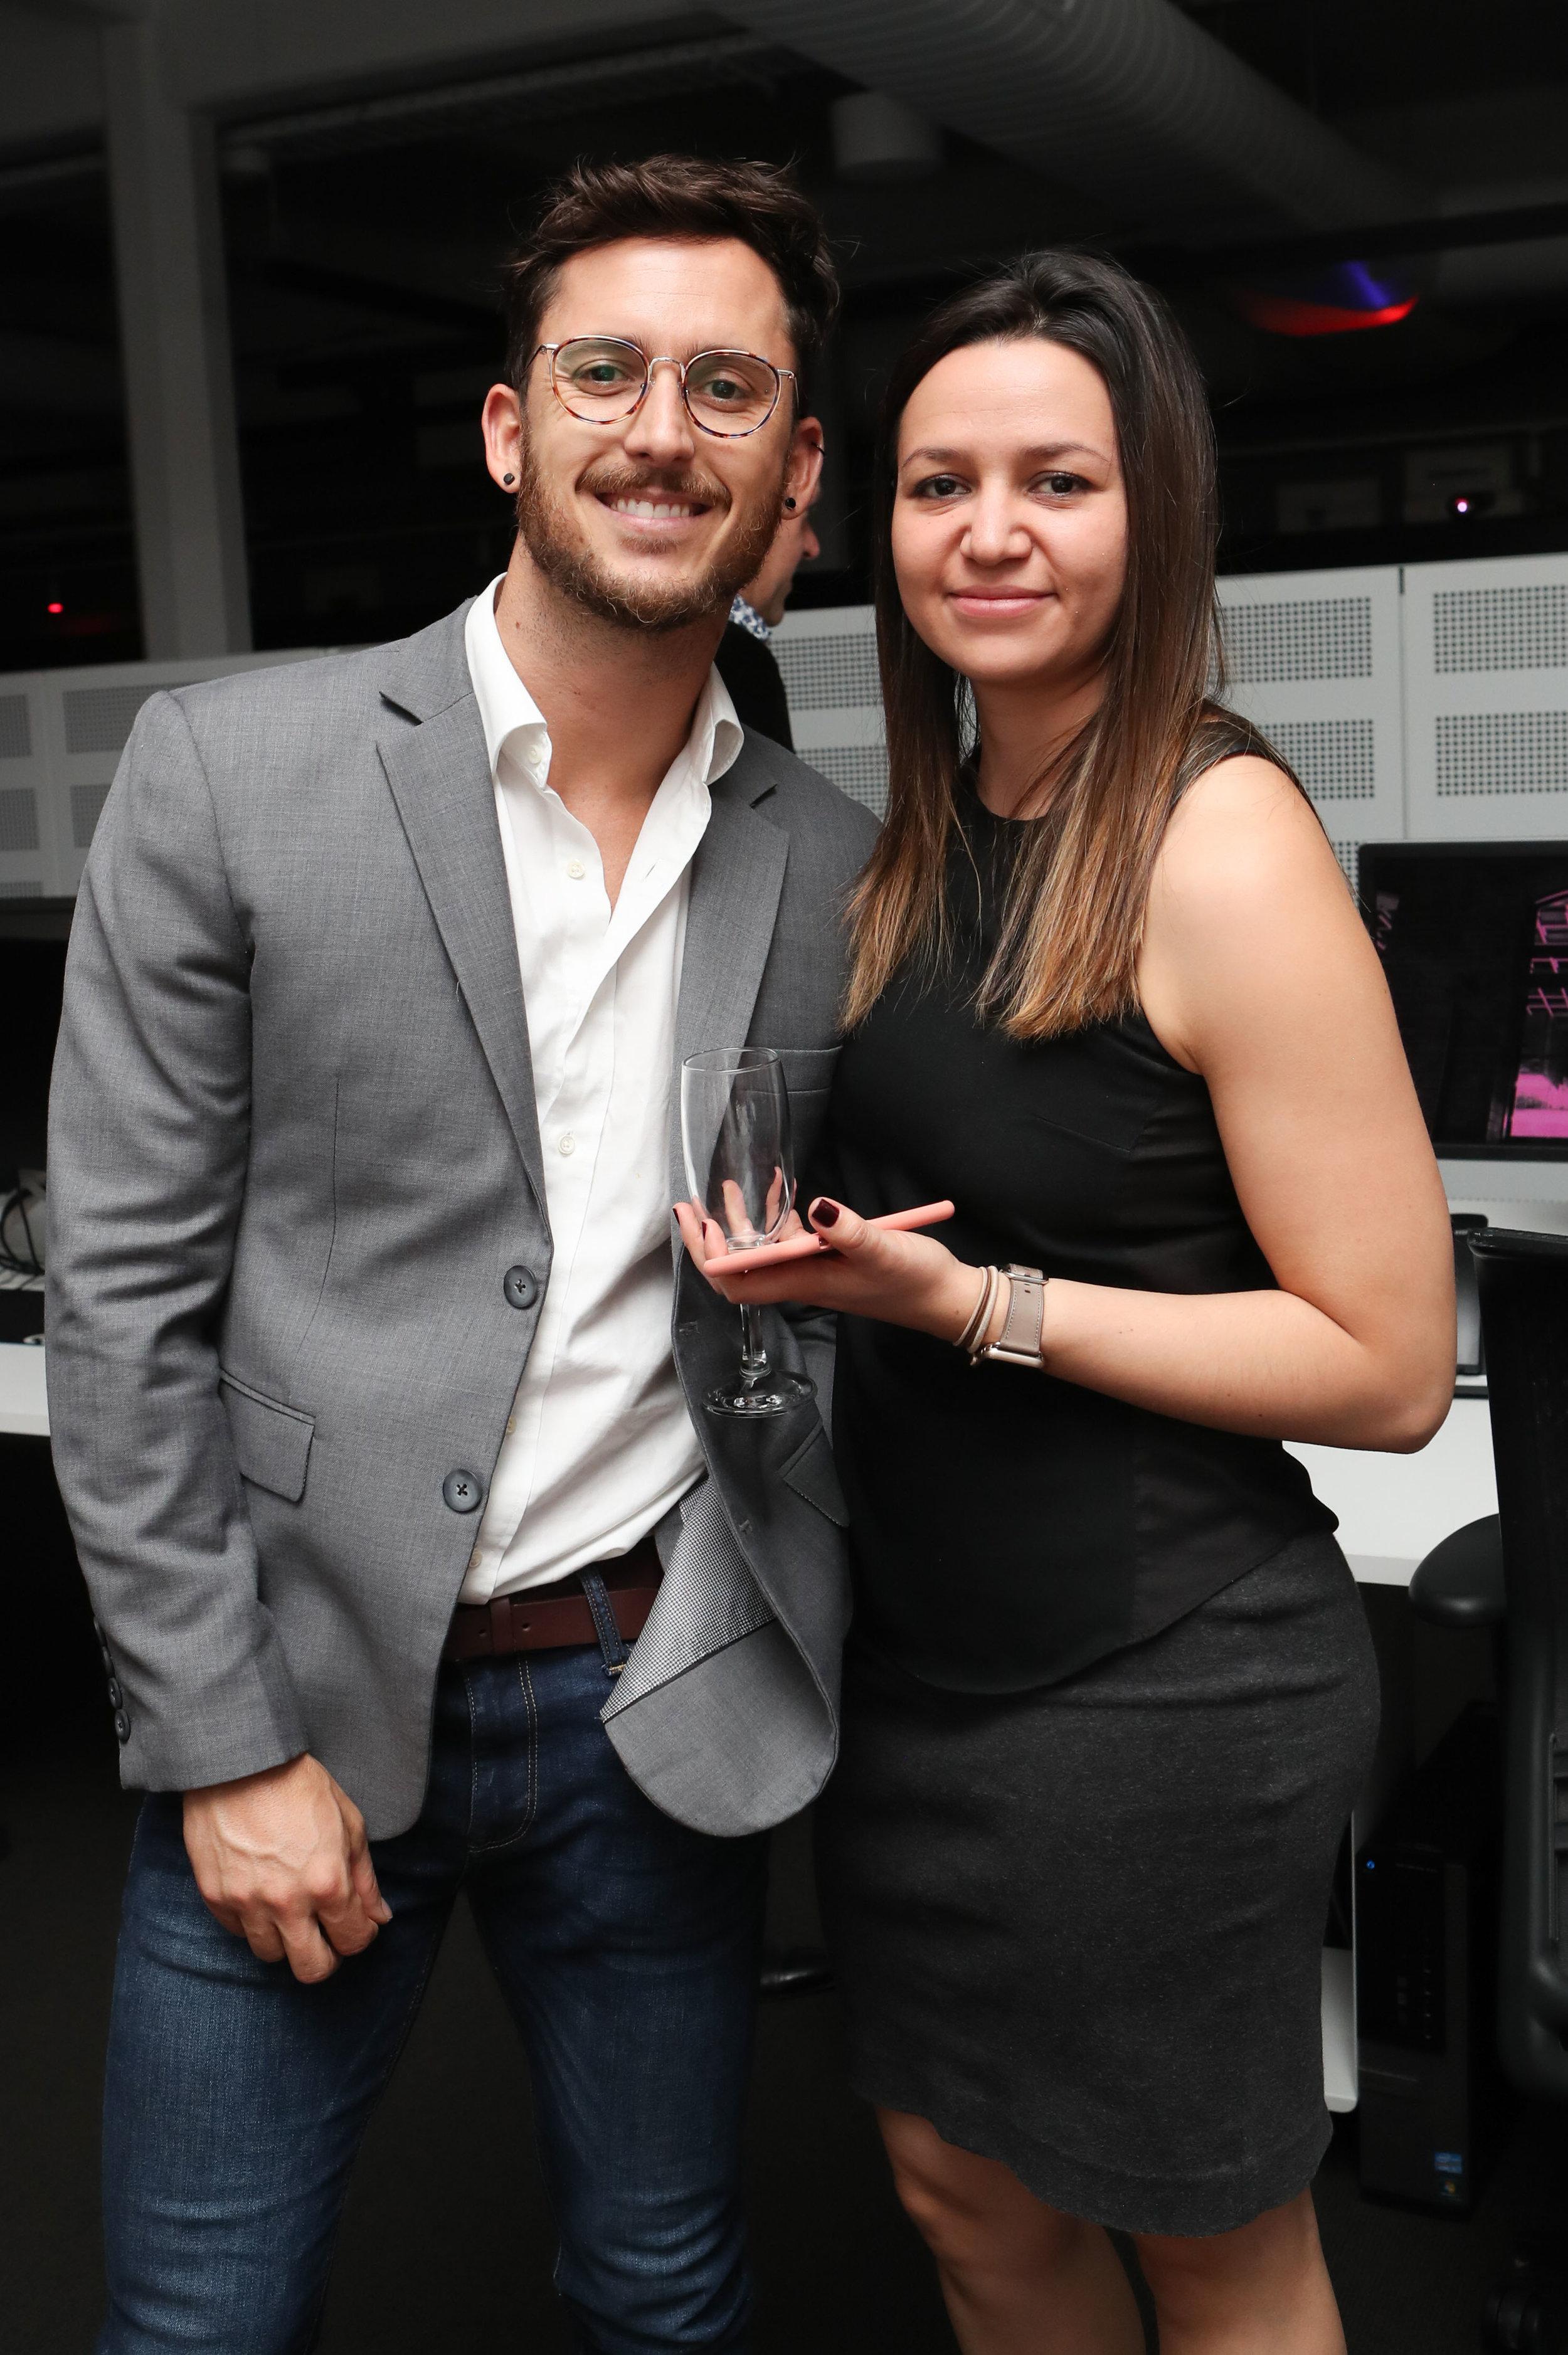 Gabriel Jensen and Diana Pardo (2).jpg